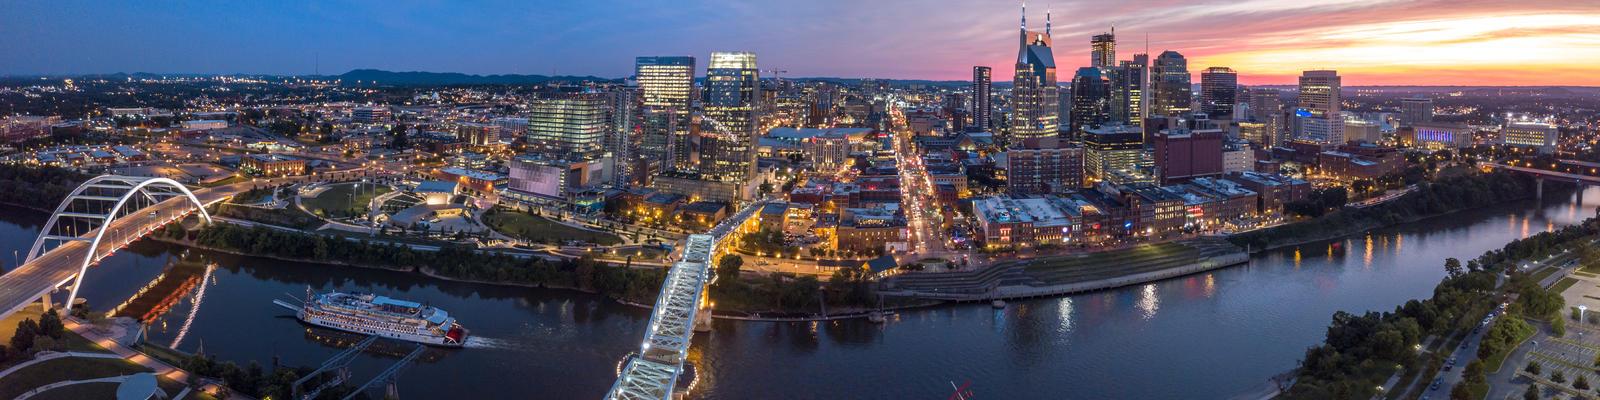 Nashville Skyline along the Cumberland River, Nashville, Tennessee, USA (Photo: Jrossphoto/Shutterstock)